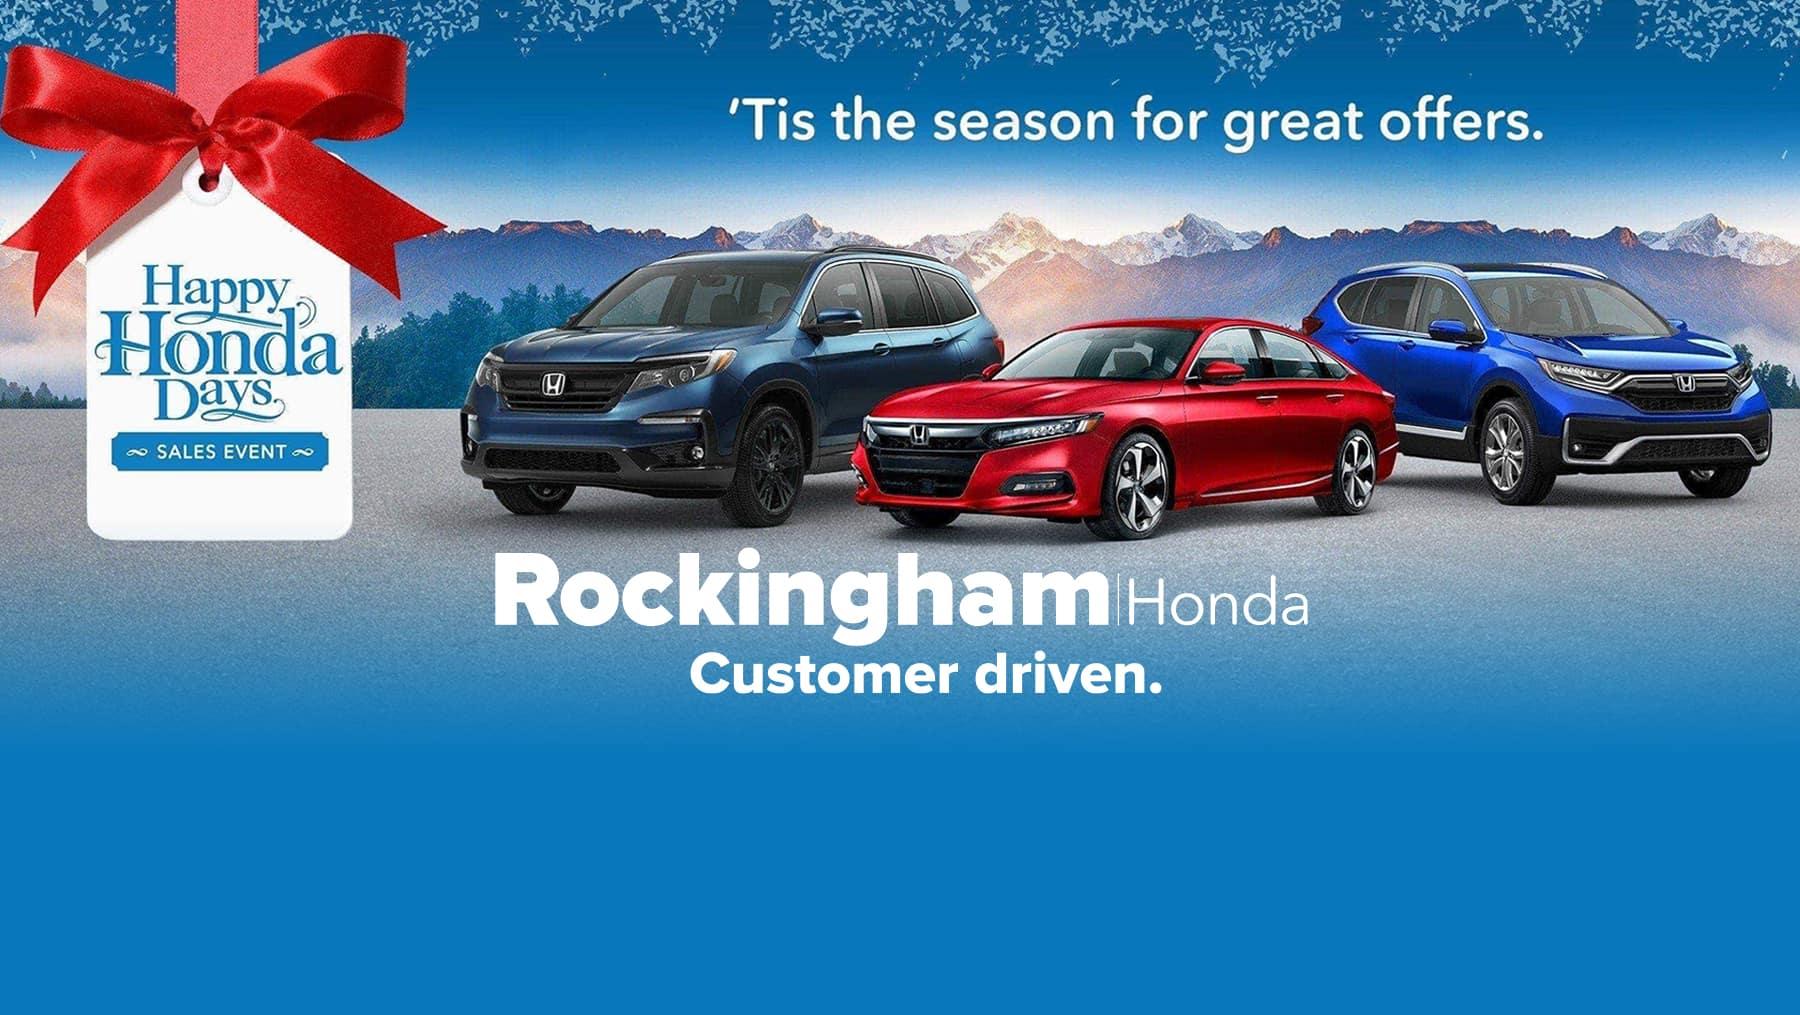 rockingham_honda_holiday_hero_1800X1015